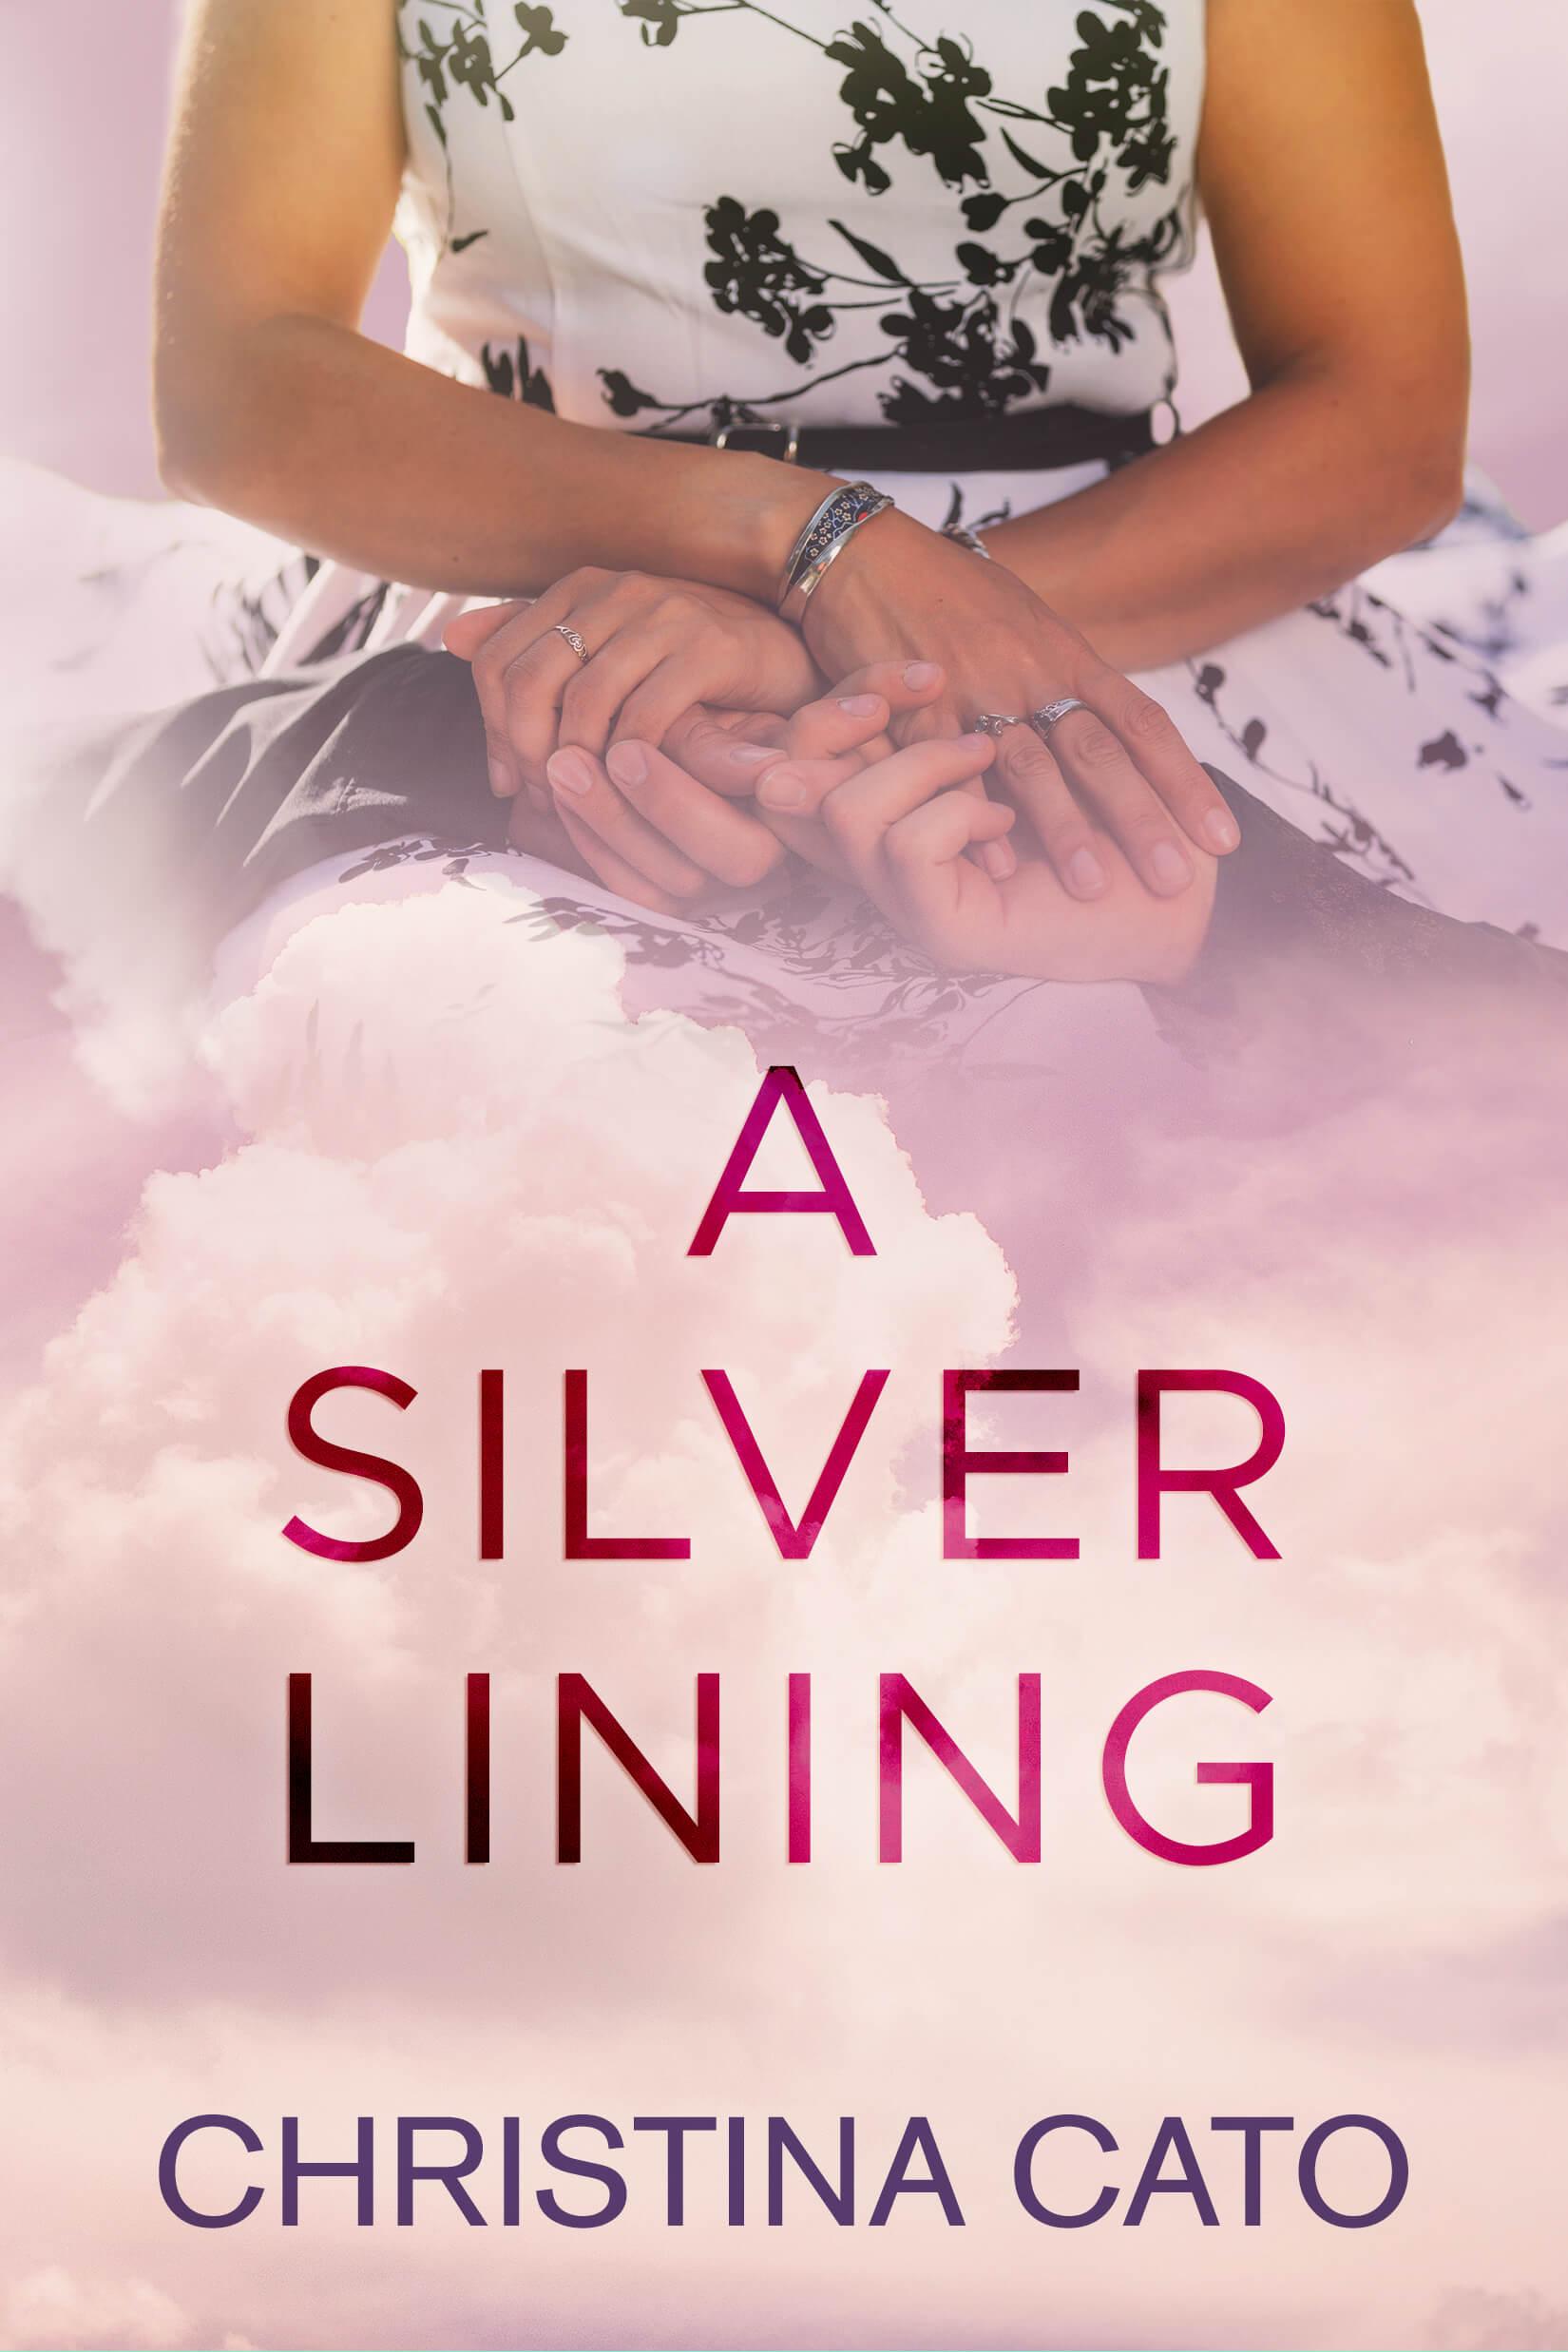 A Silver Lining - Christina Cato